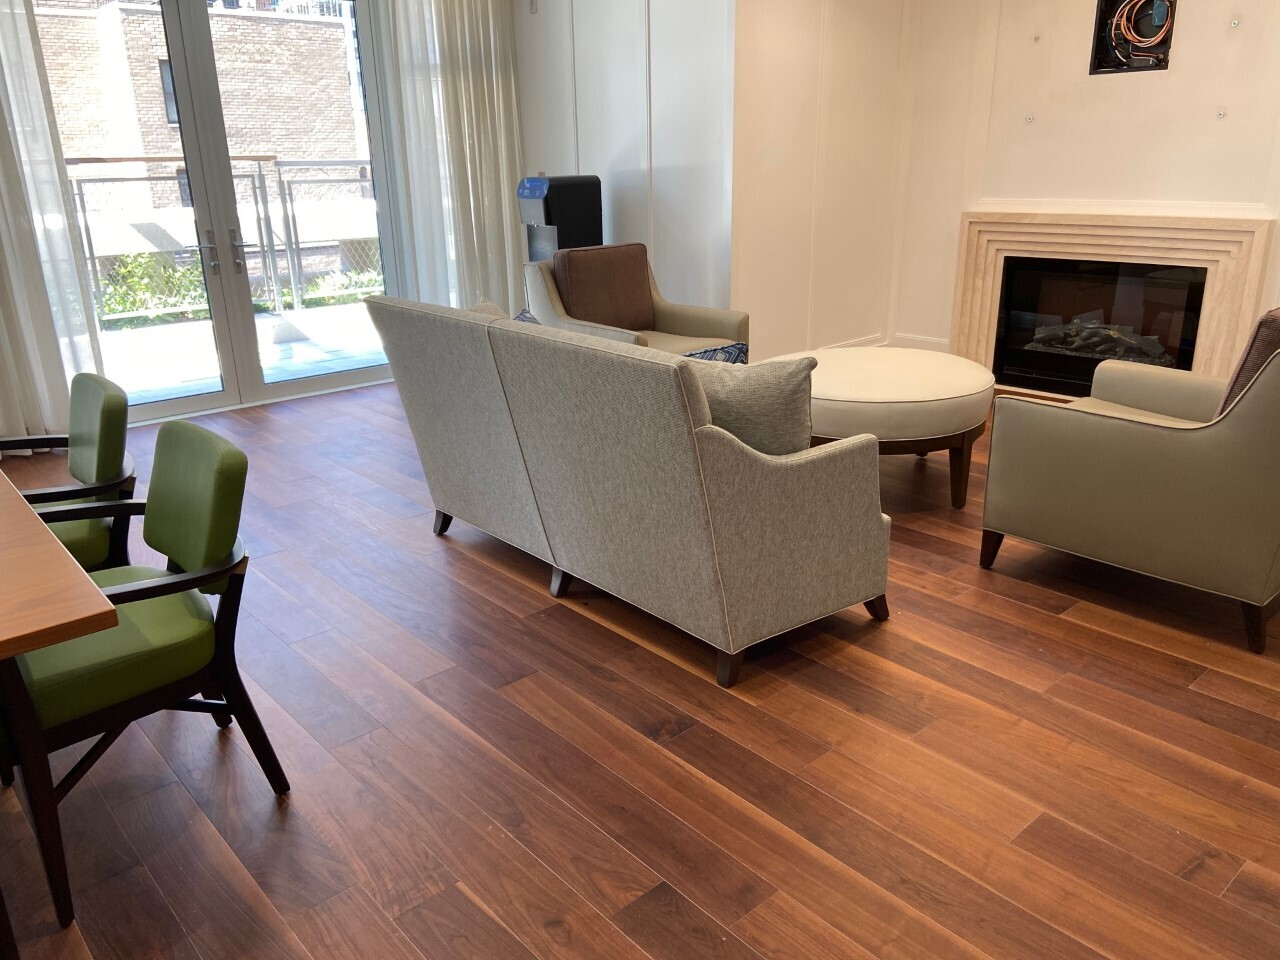 The gorgeous sitting room has engineered walnut flooring